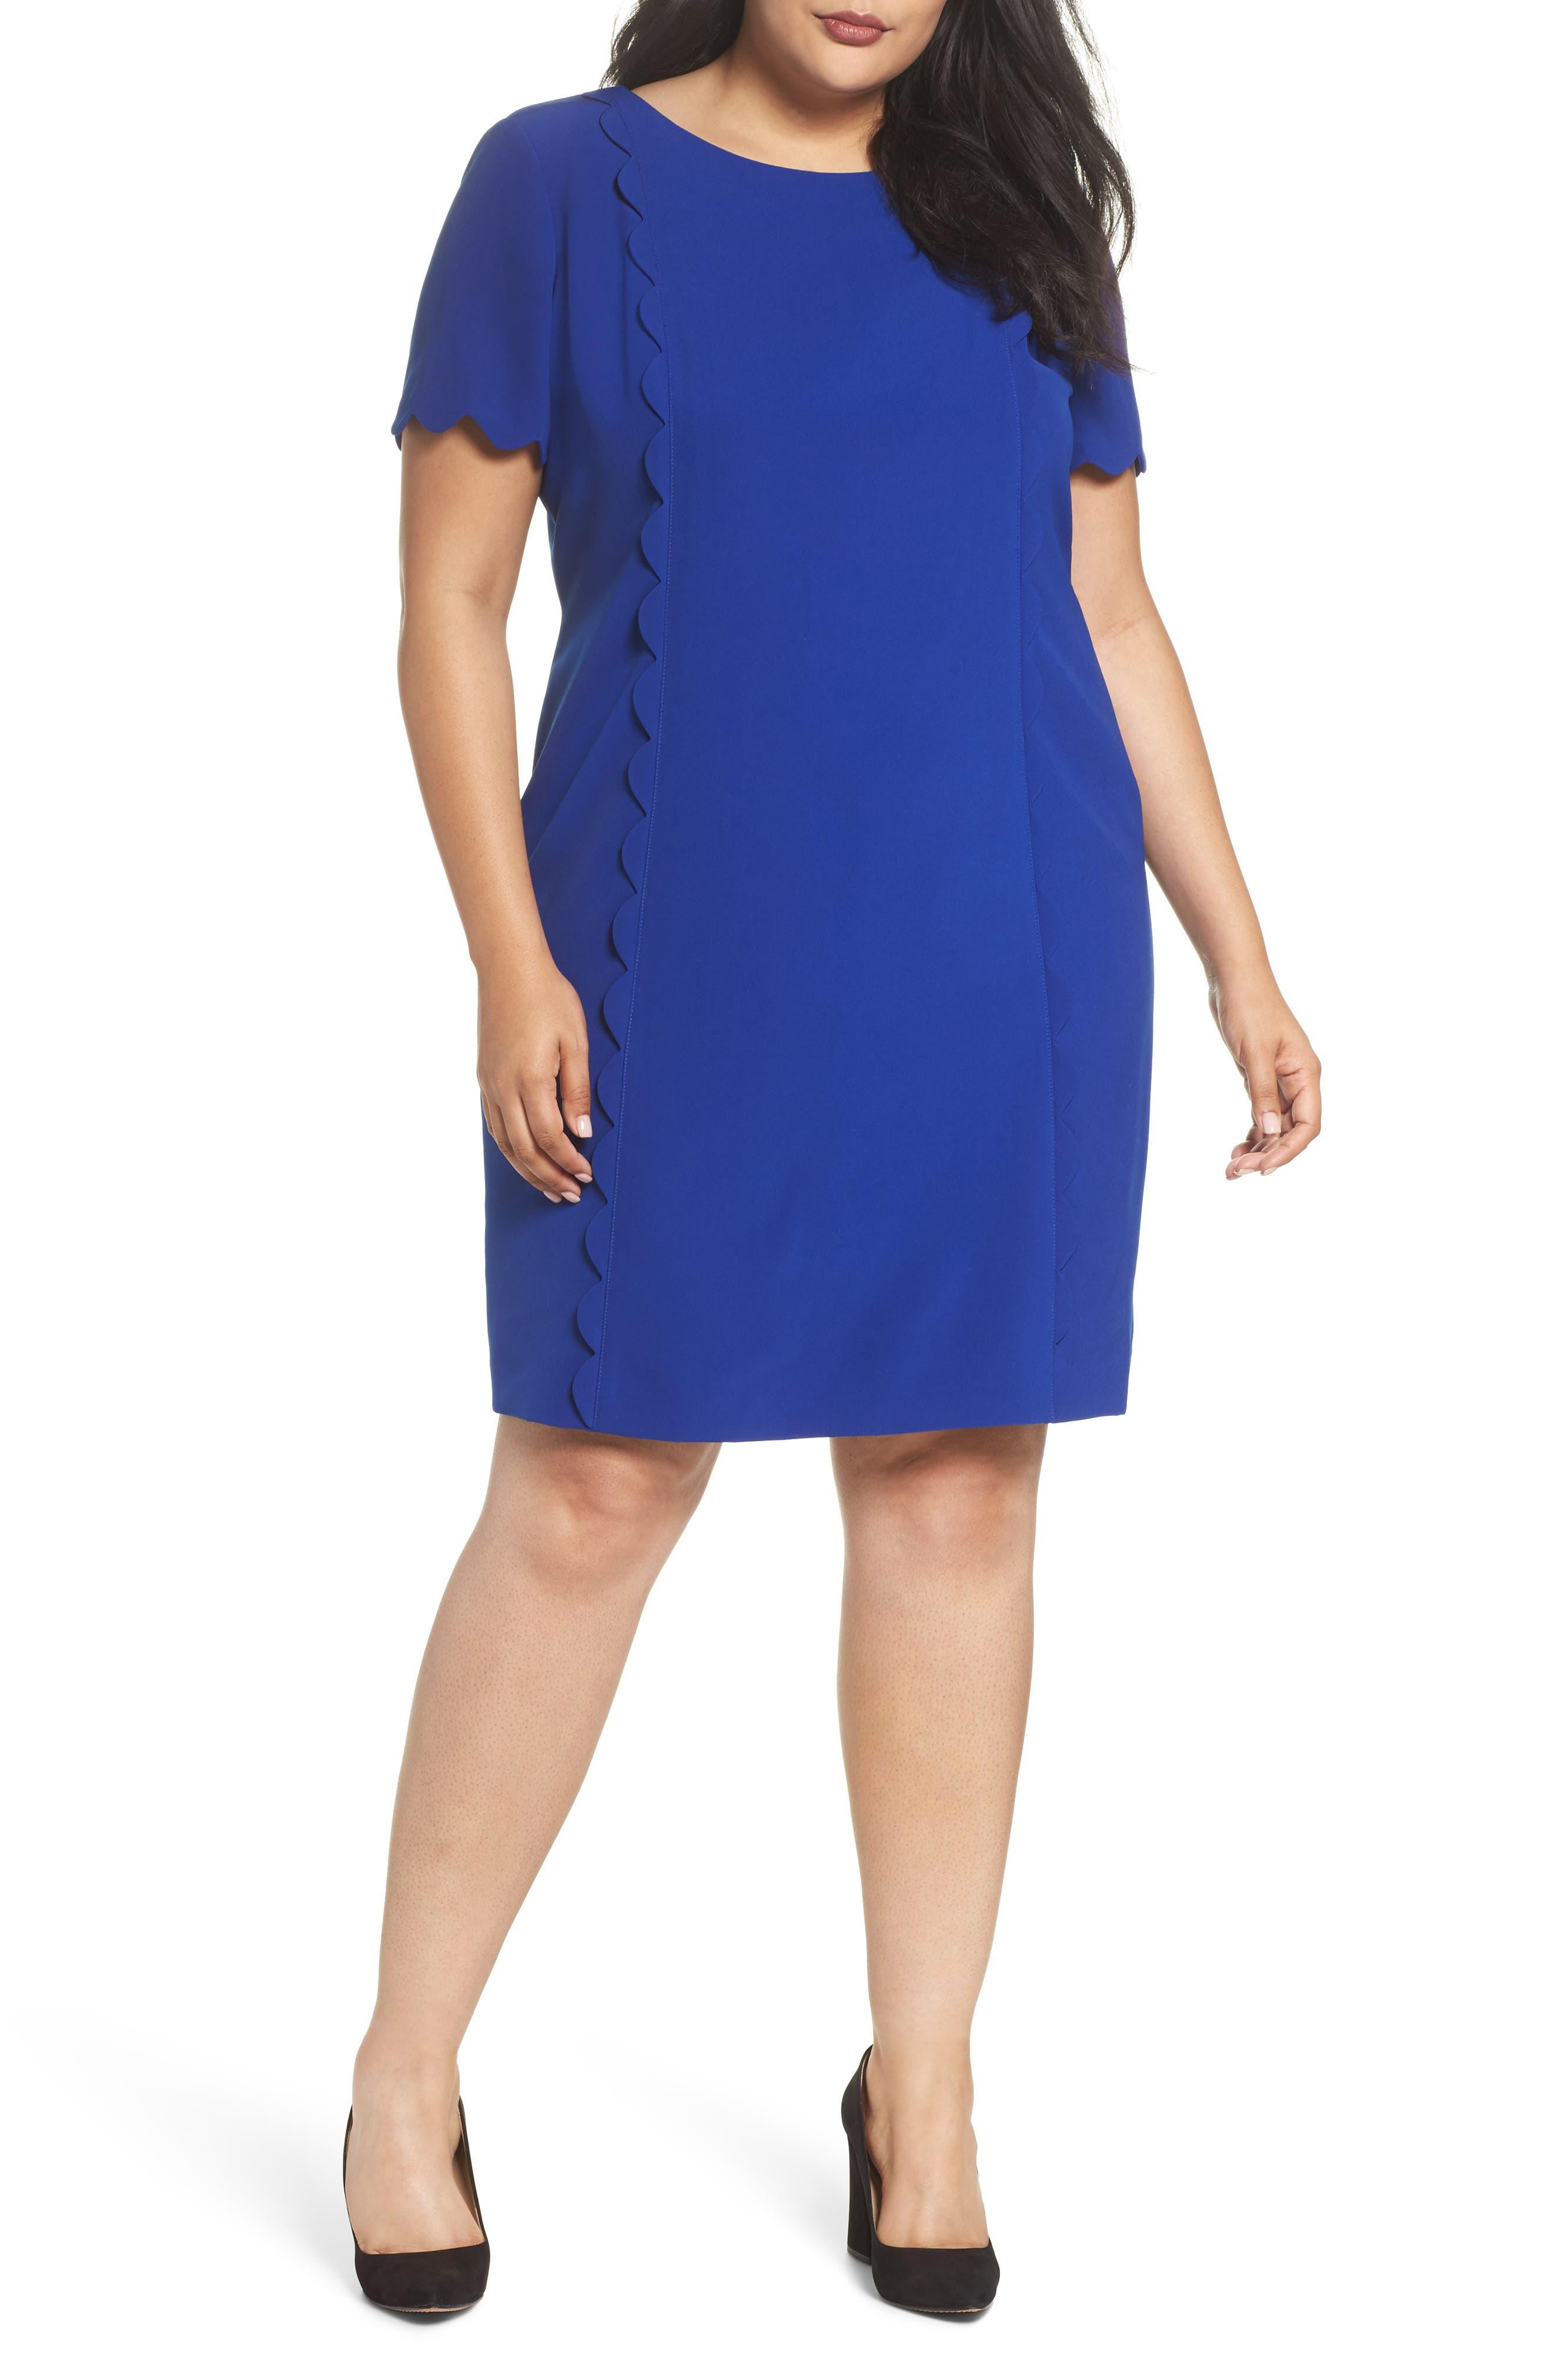 Main Image - Tahari Scalloped Trim Shift Dress (Plus Size)